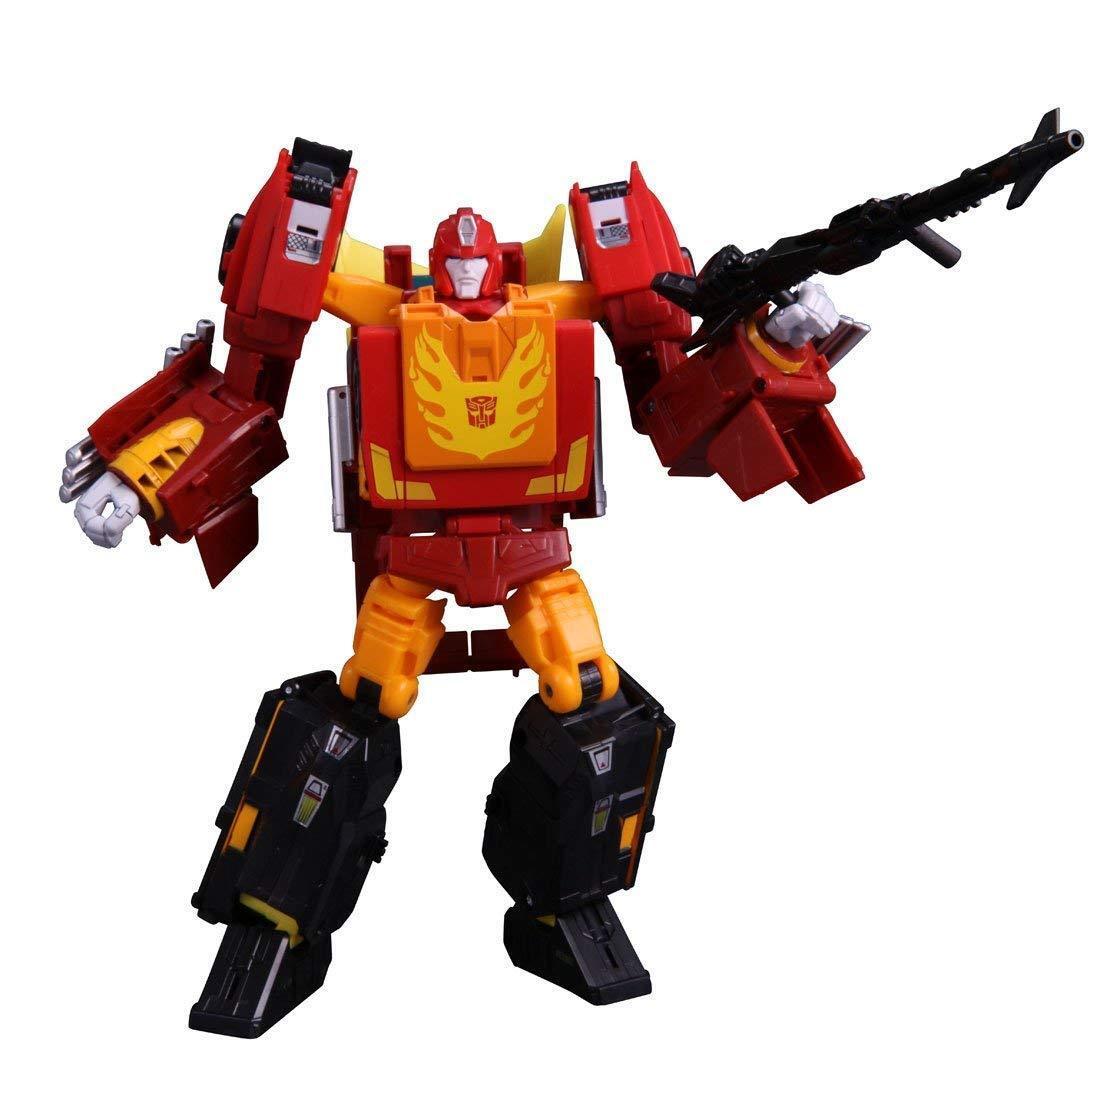 MISB in USA  Transformers Takara energia of the Primes PP08 Rodimus Prime